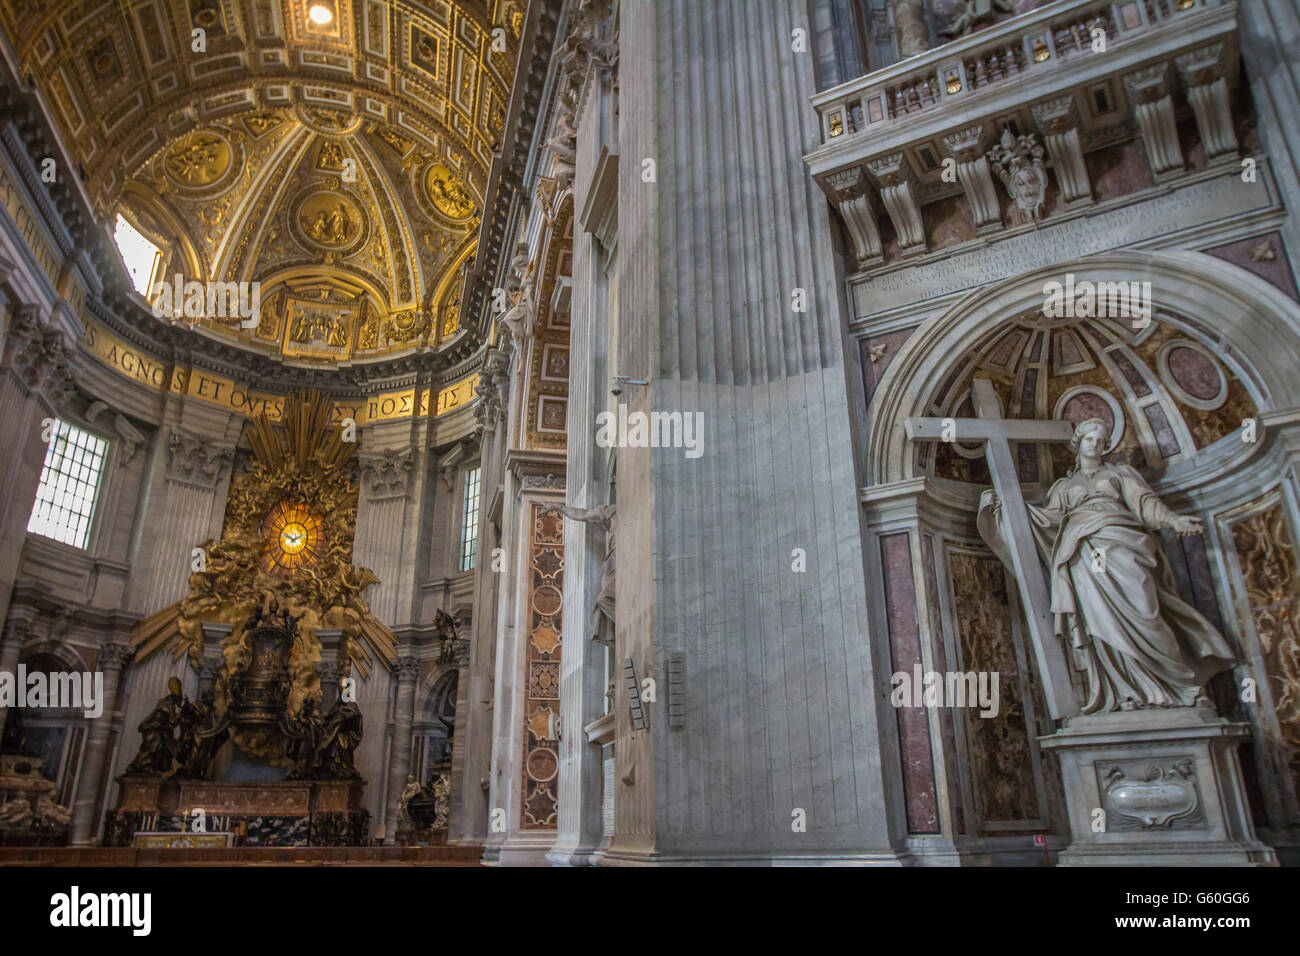 Inside Saint peters Basilican in Vatican city - Stock Image